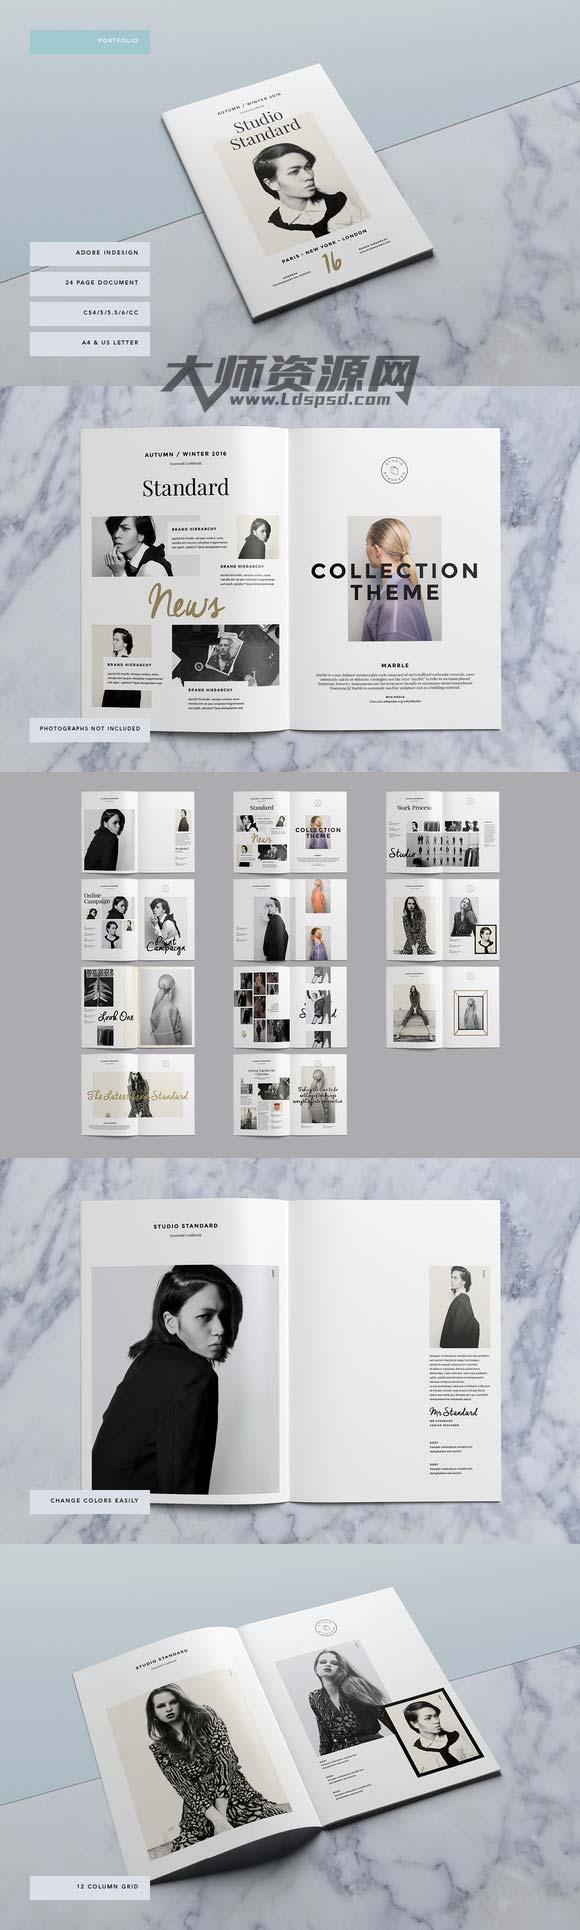 免费:indesign模板-摄影工作室画册模板:studio lookbook图片